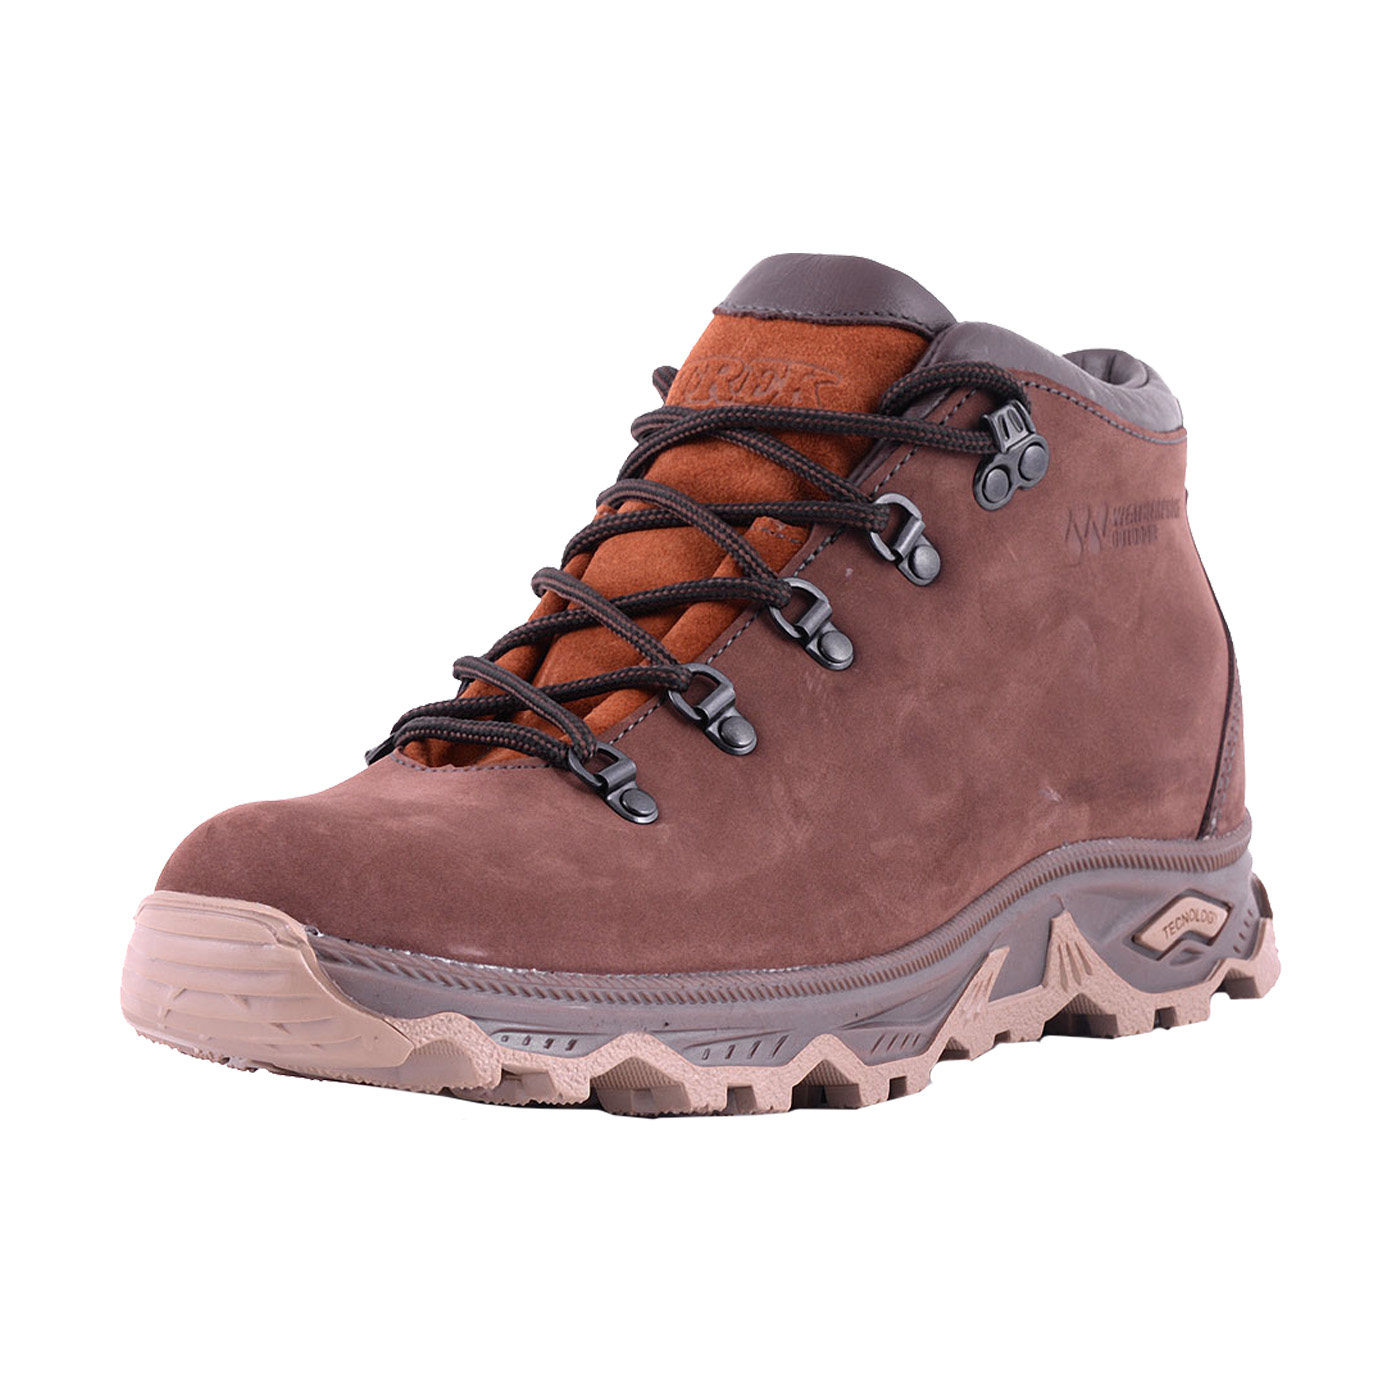 Ботинки TREK Andes6 (капровелюр), Ботинки - арт. 1129360177